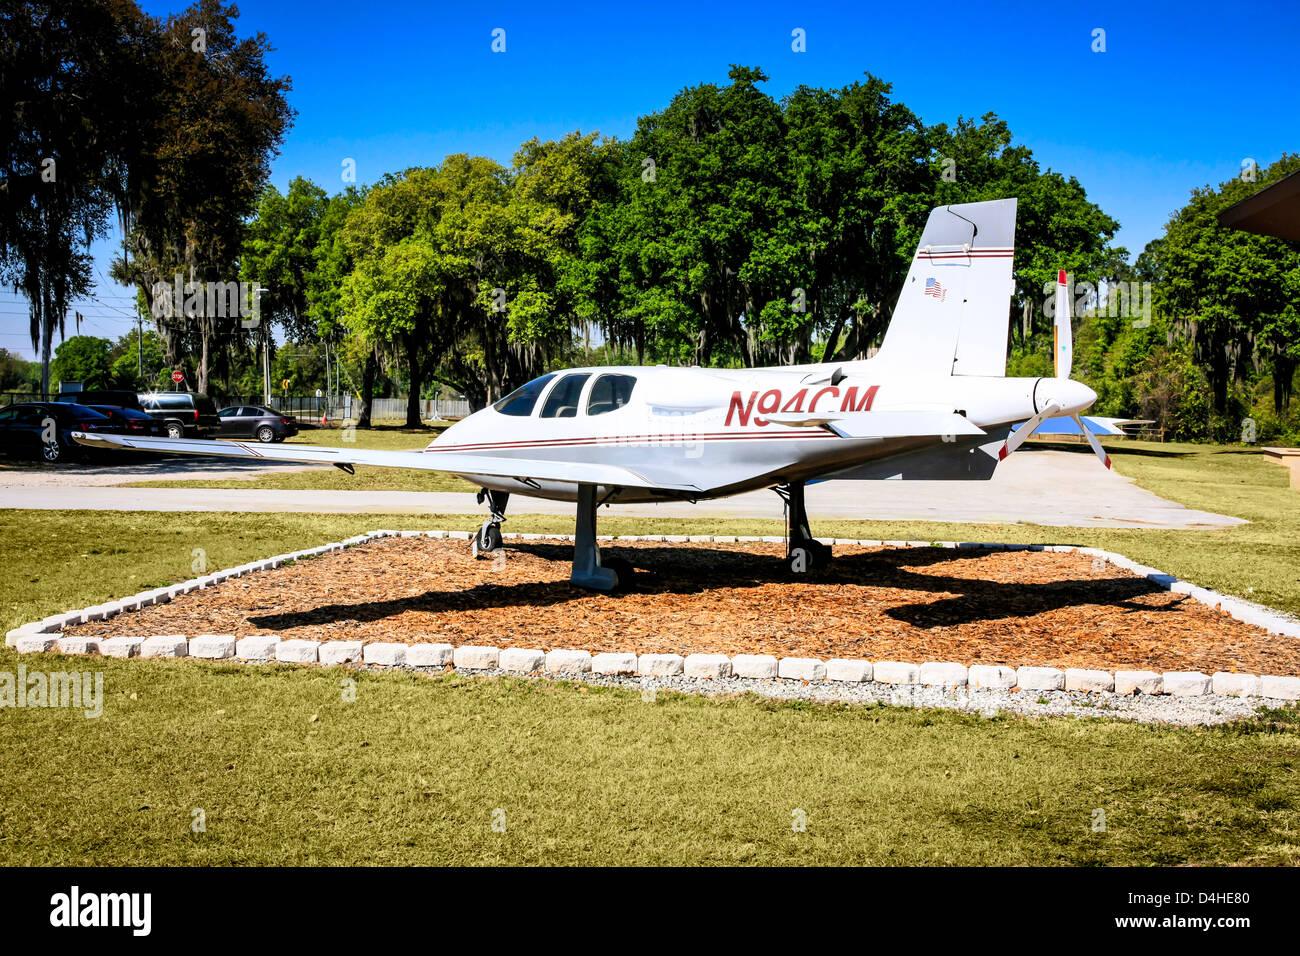 A Cirrus VK-30 plane outside the Sun n Fun Florida Air Museum at Lakeland - Stock Image